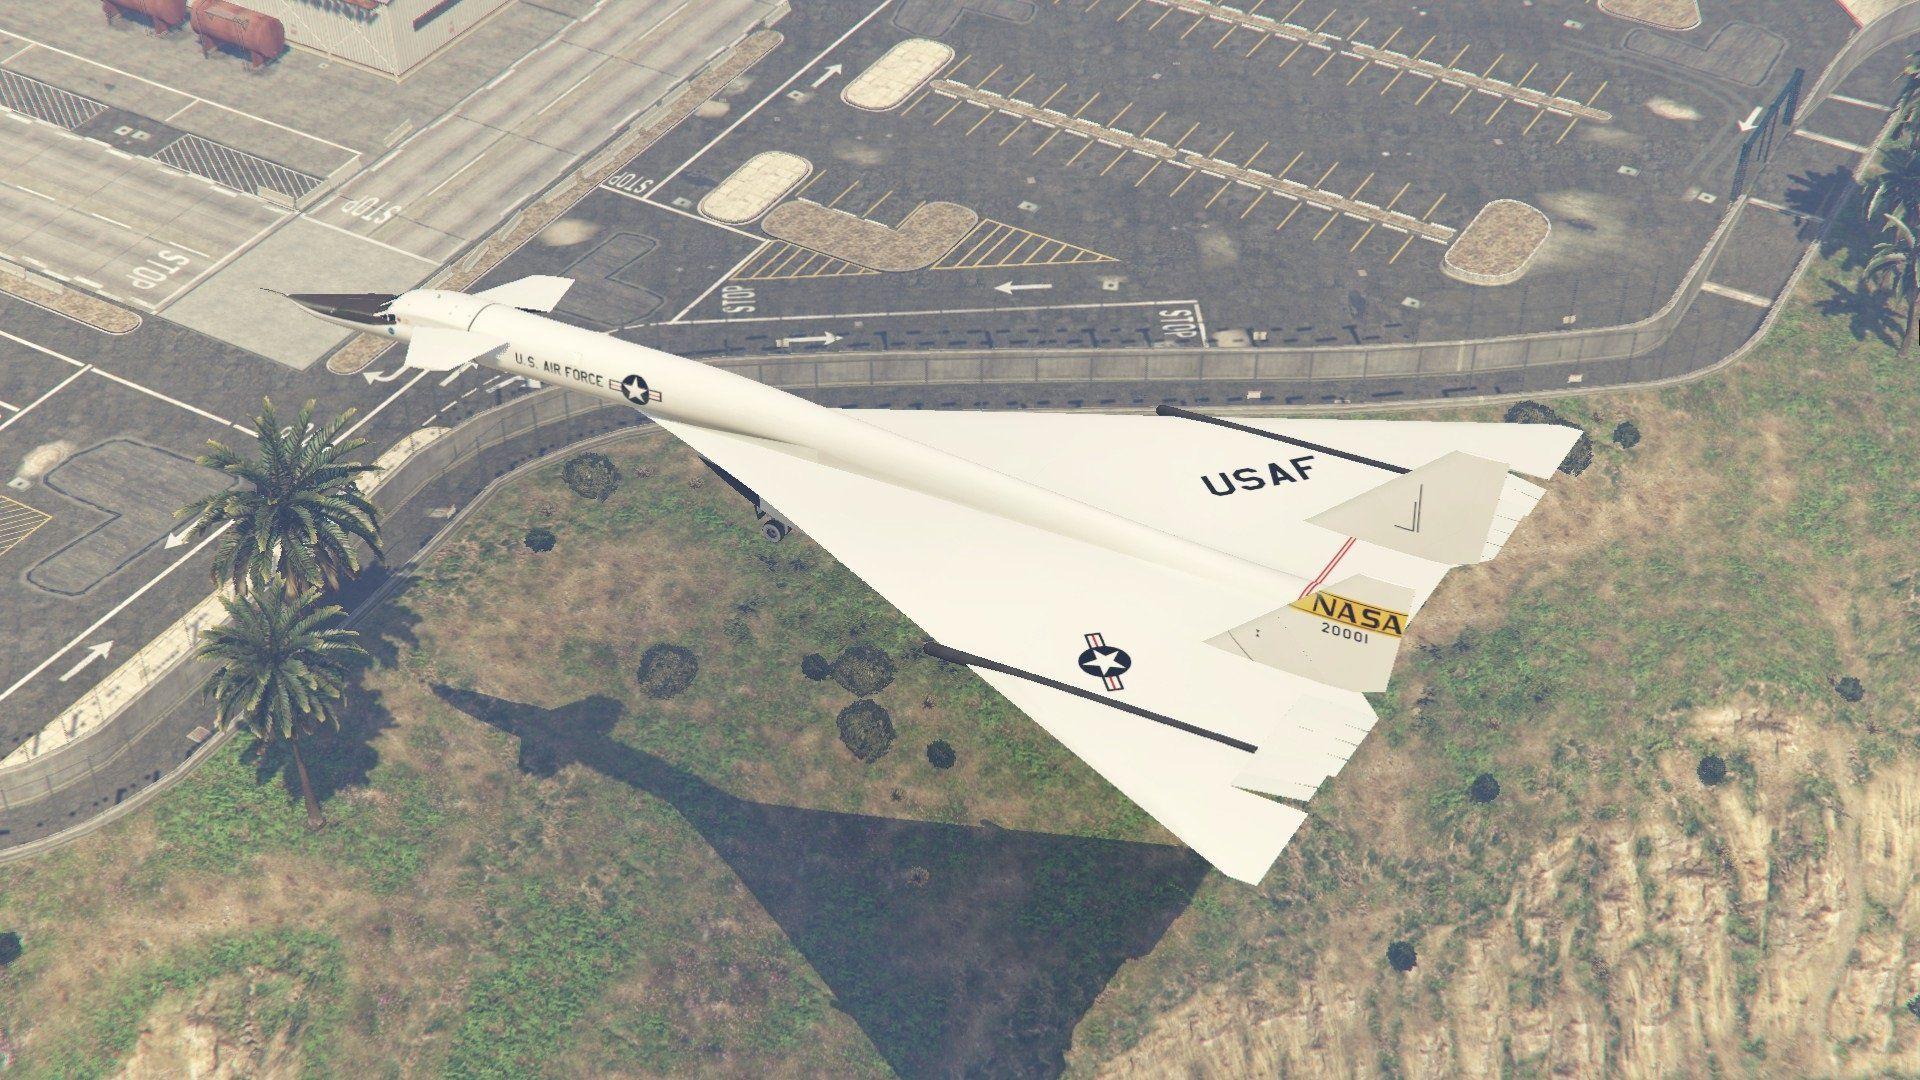 XB-70 Valkyrie (Mach 3 high speed bomber) - GTA5-Mods com | Planes